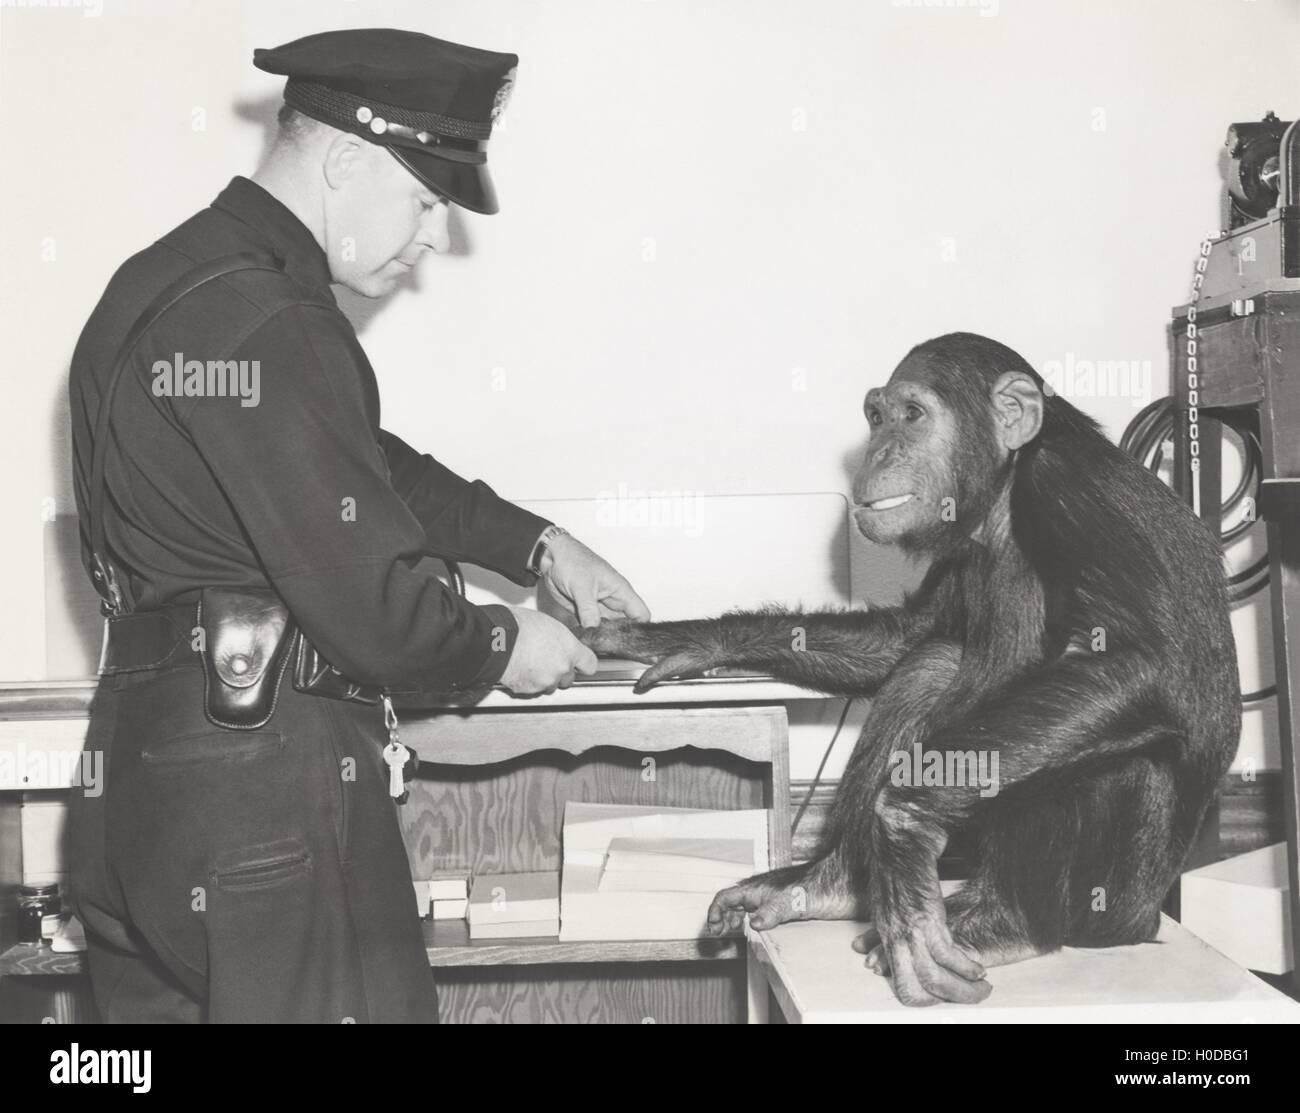 Monkey fingerprinted by police officer - Stock Image